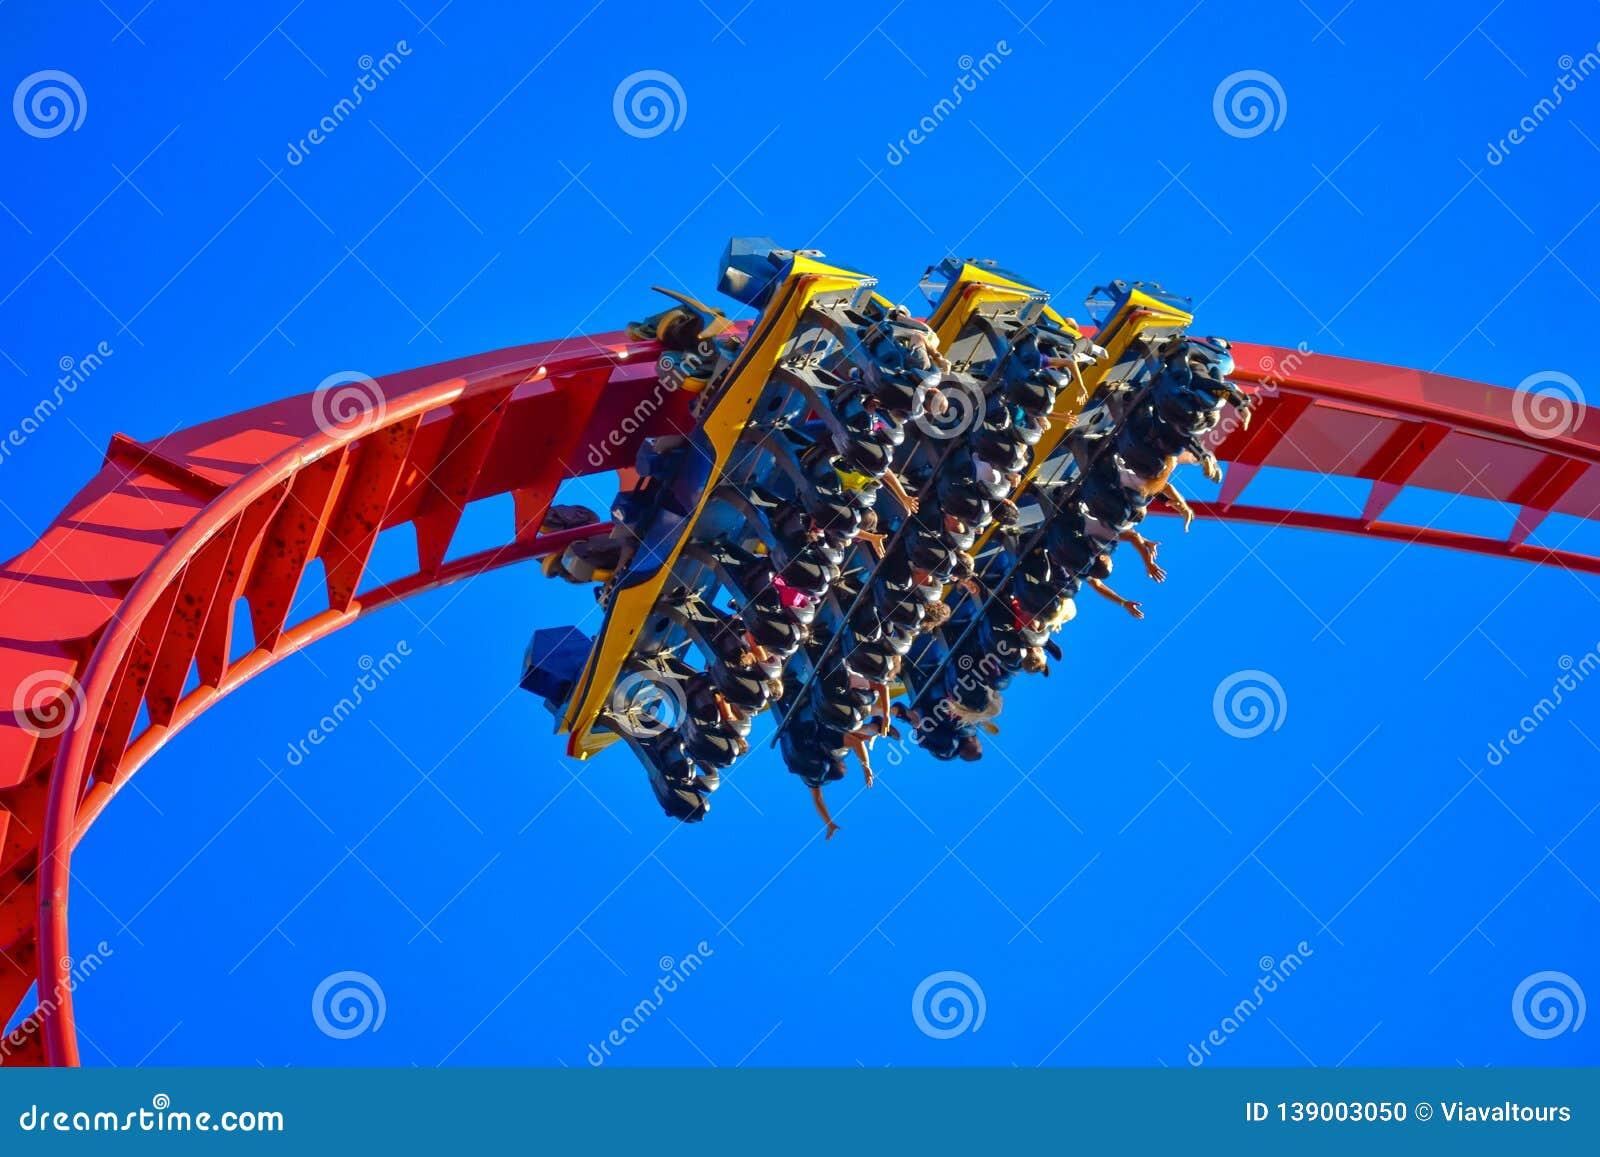 . People enjoying amazing inverted rollercoaster at Bush Gardens Tampa Bay